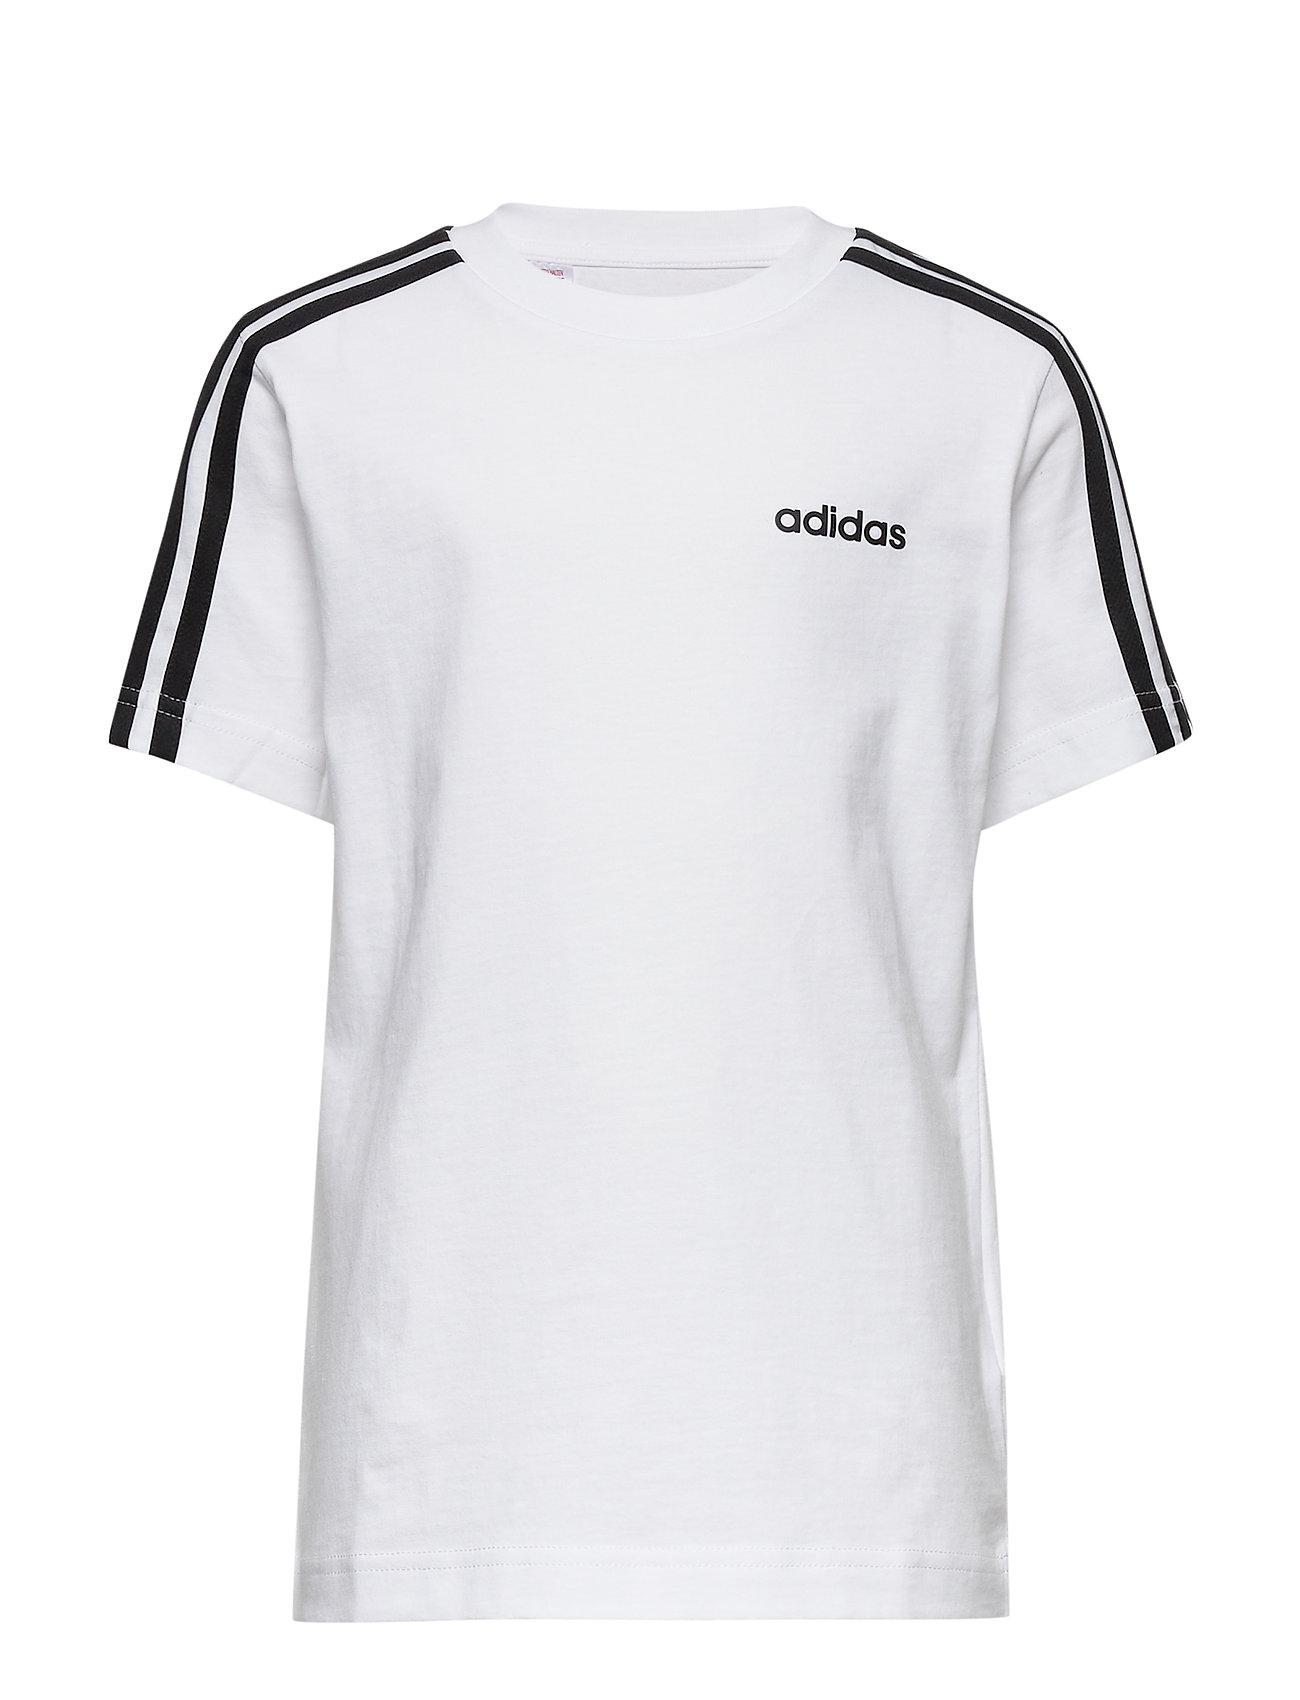 adidas Performance YB E 3S TEE - WHITE/BLACK